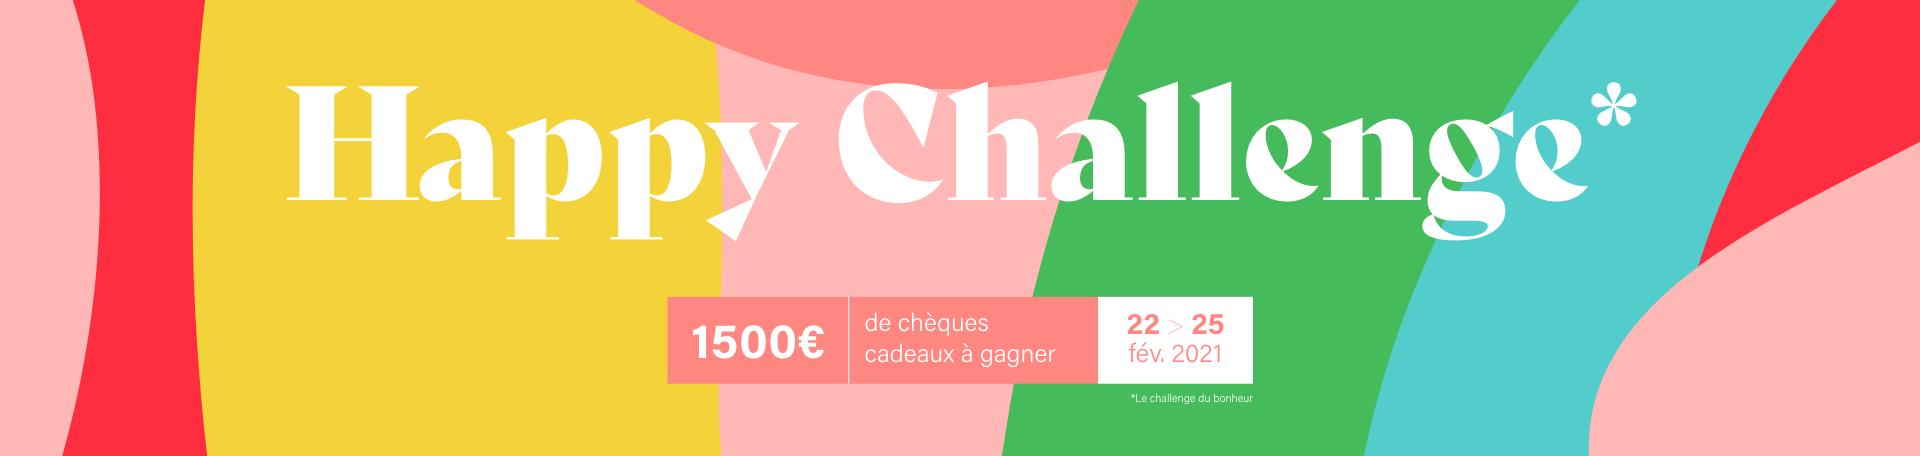 Jeu concours : Happy Challenge